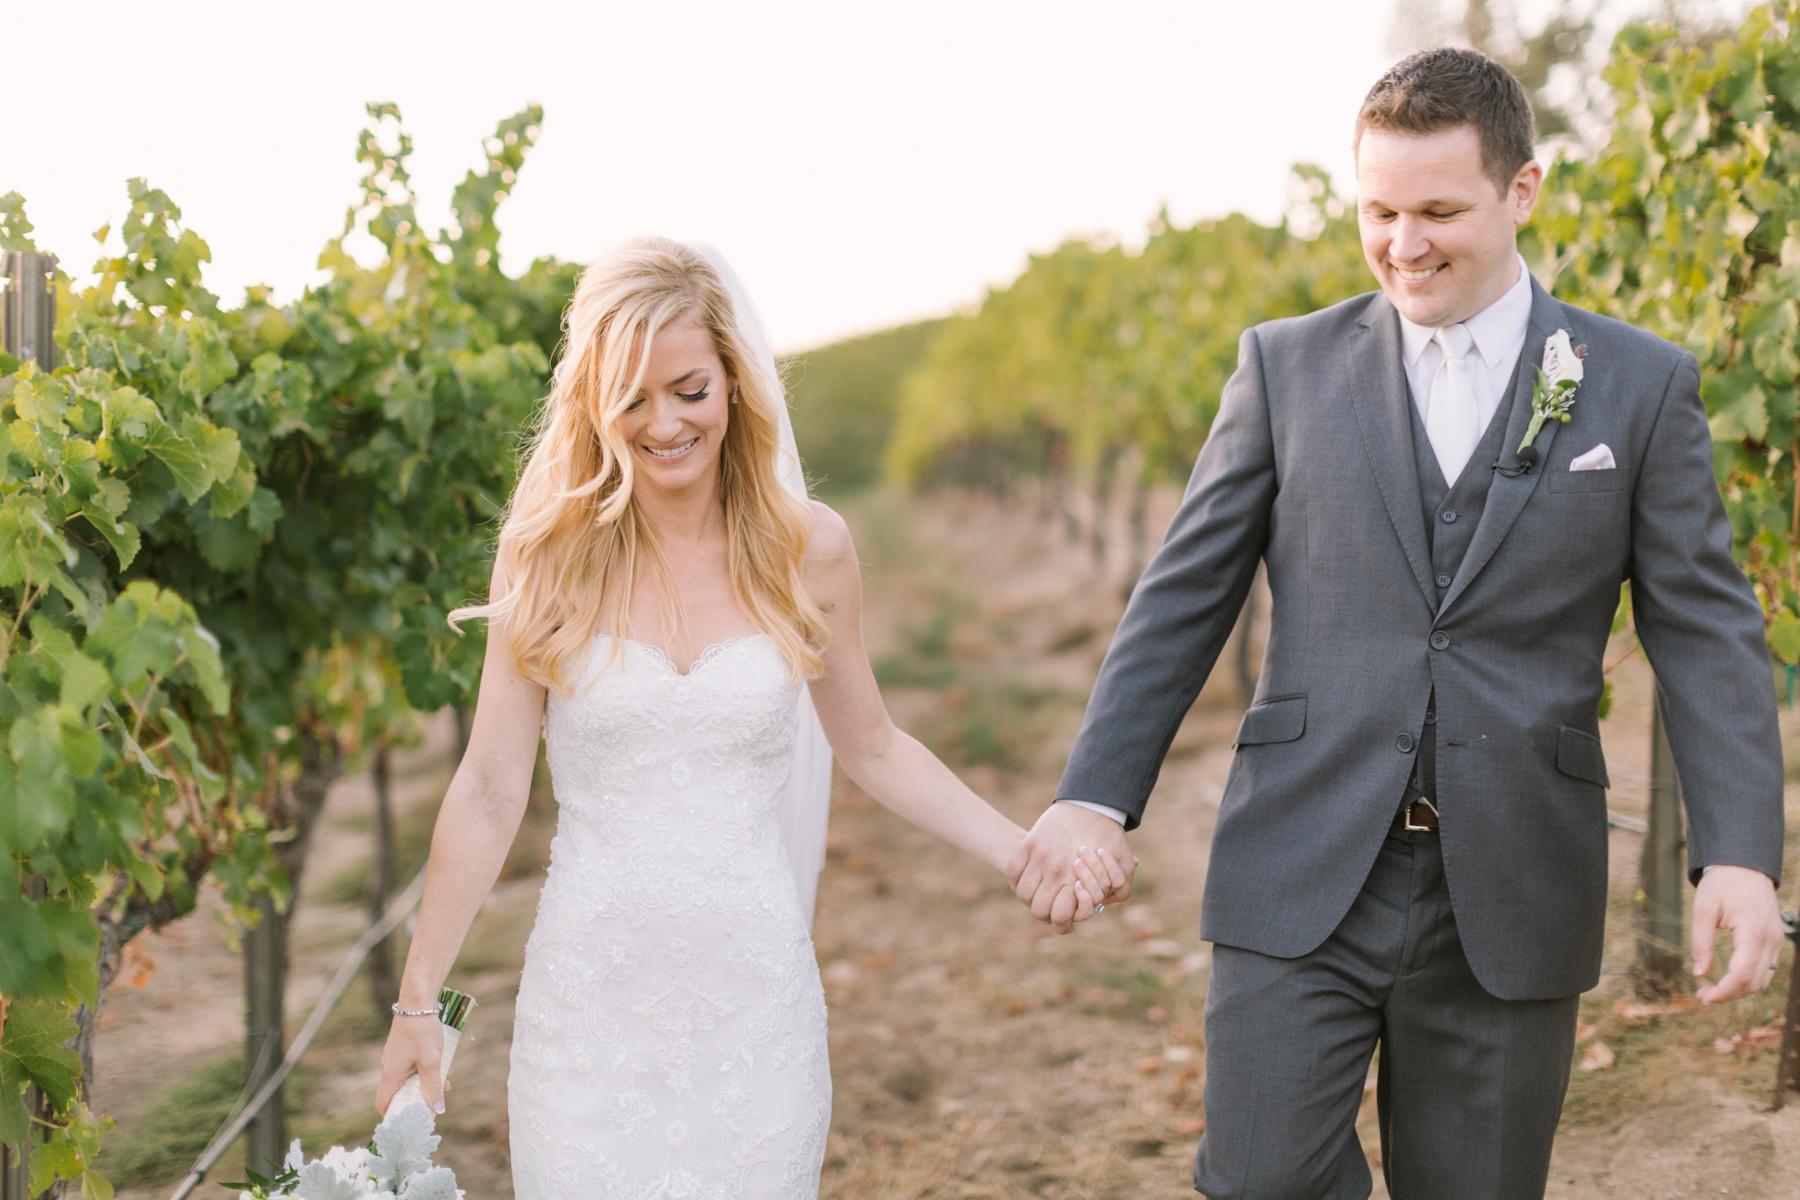 Orange-County-Wedding-Photography-Brianna-Caster-and-Co-Photographers-Falkner-Winery-Wedding-10